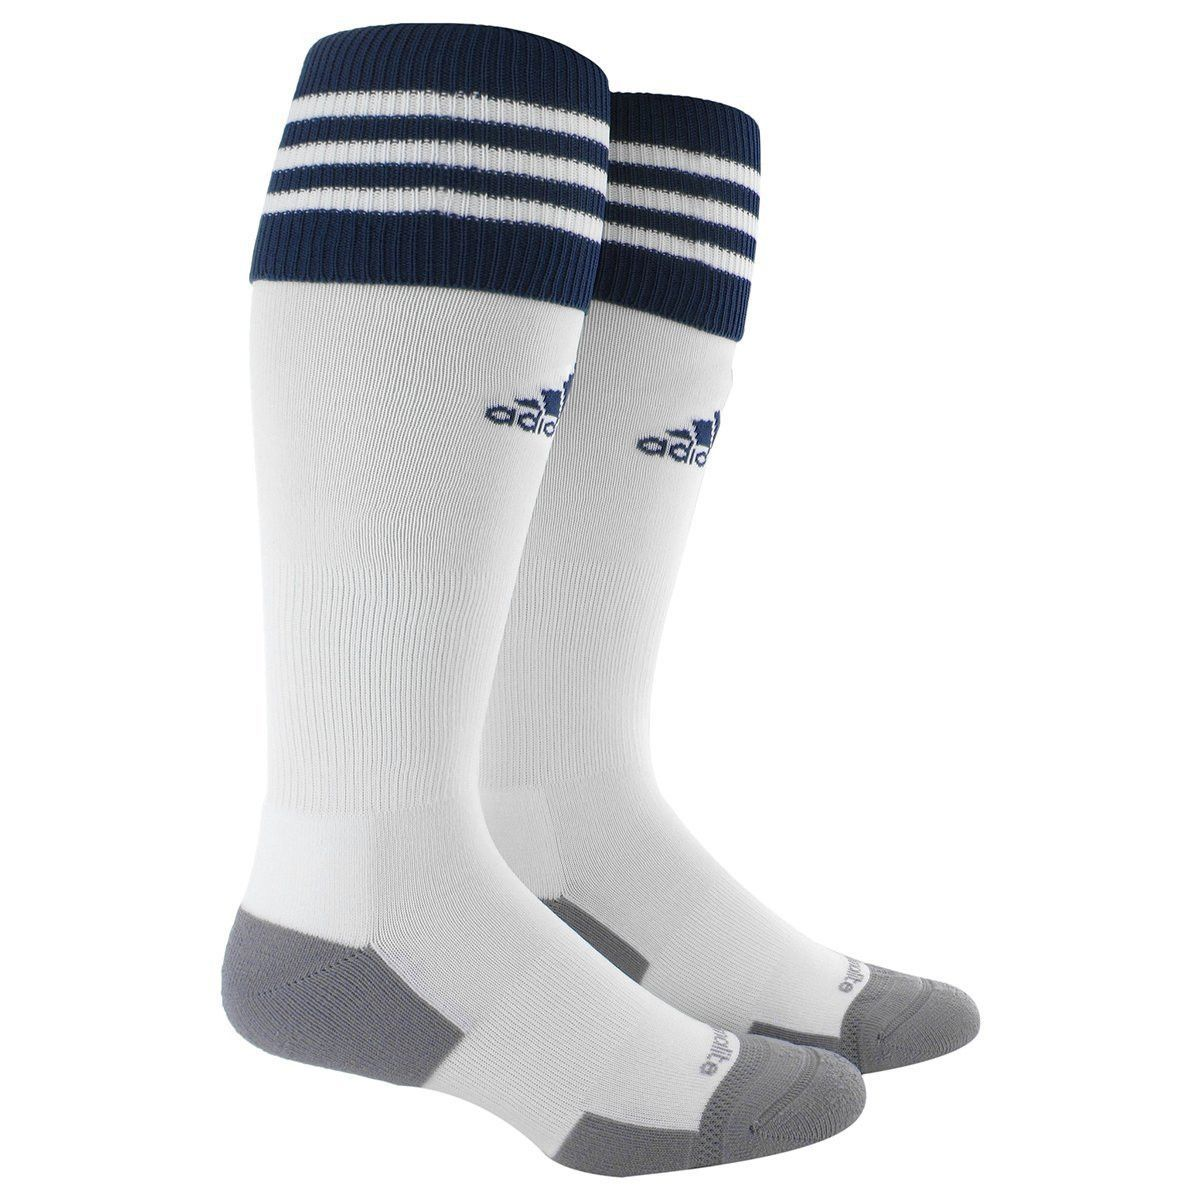 f4d8bb033741 Adidas Copa Zone Cushion 2.0 Socks (White Navy)